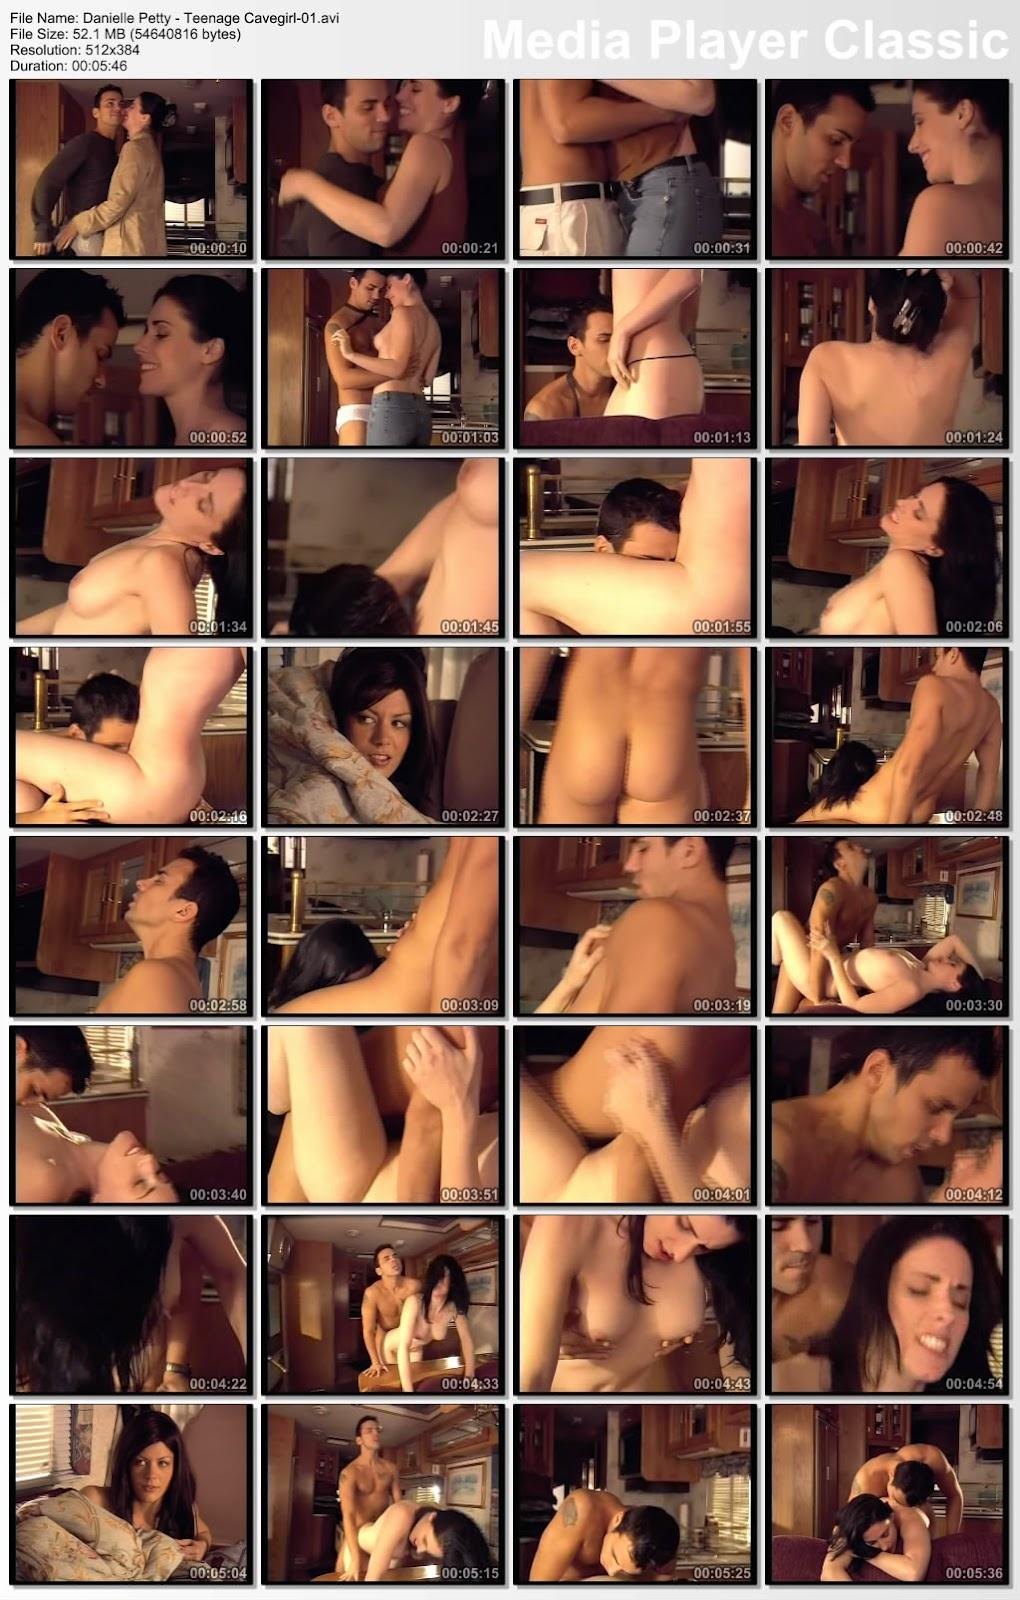 Danielle Petty - Teenage Cavegirl Sex Scene